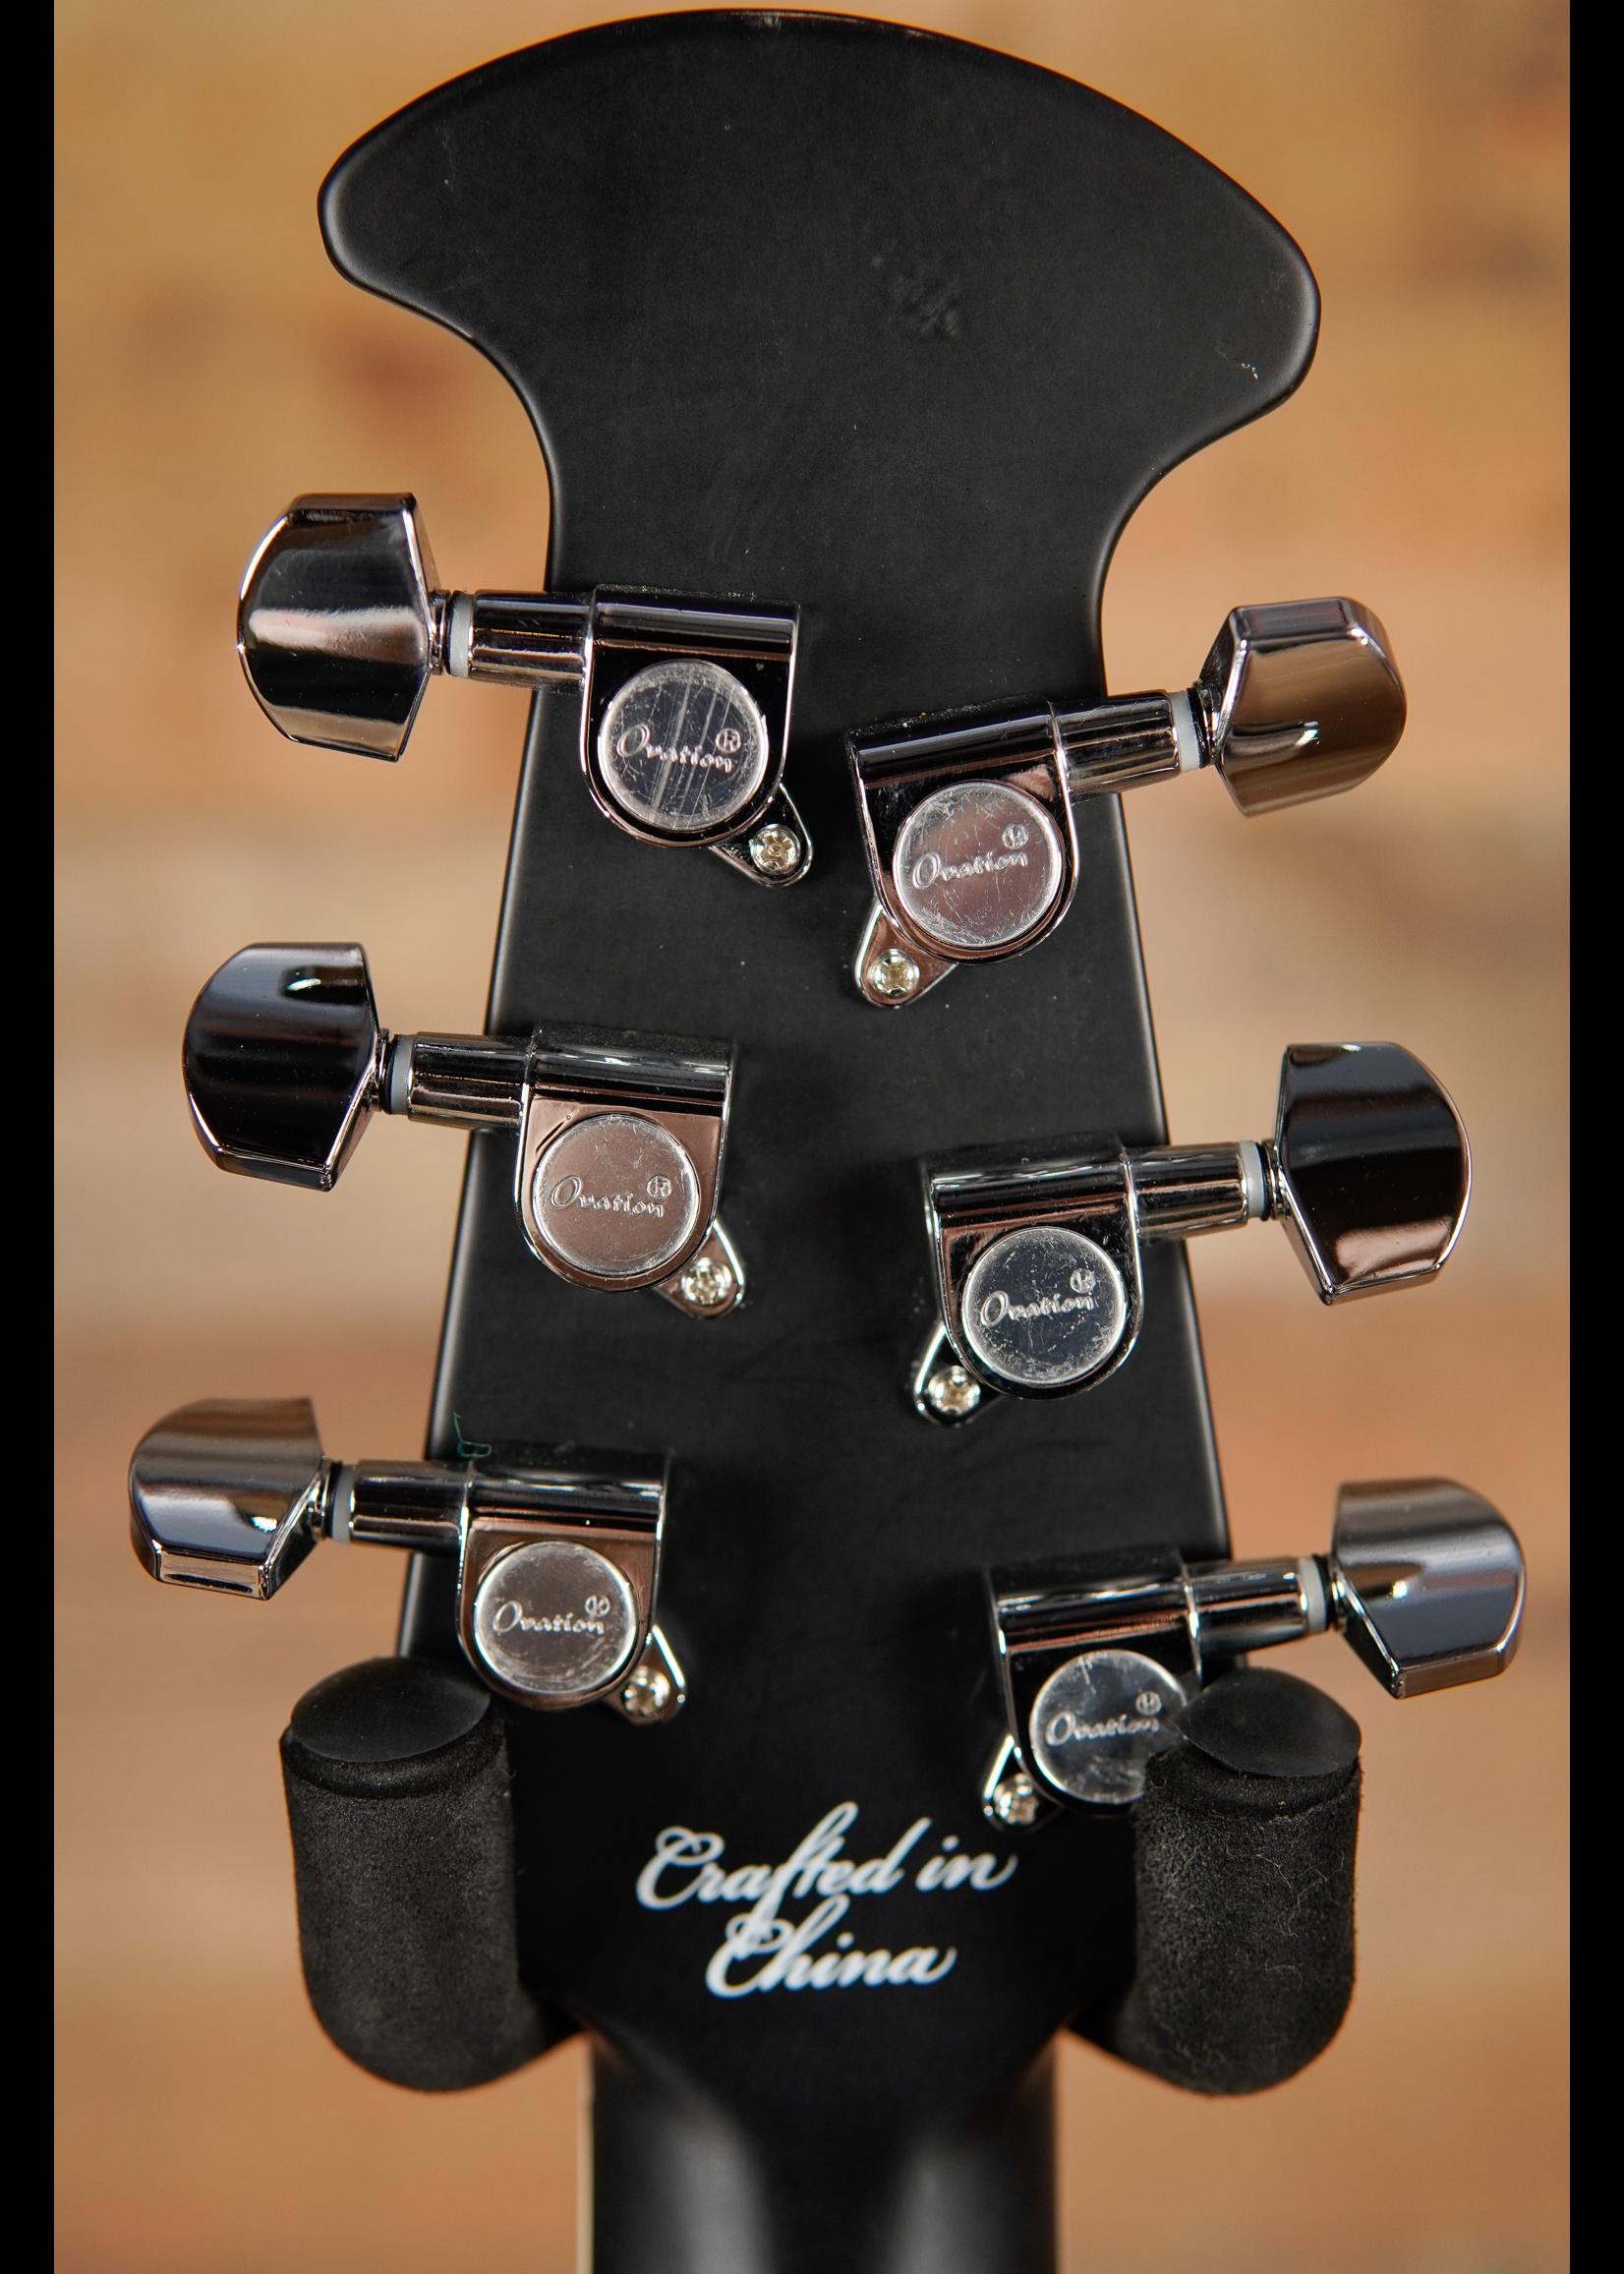 Ovation Ovation Celebrity Standard E-Acoustic Guitar CS24-5, CS/Cutaway, Black,Mid-Depth